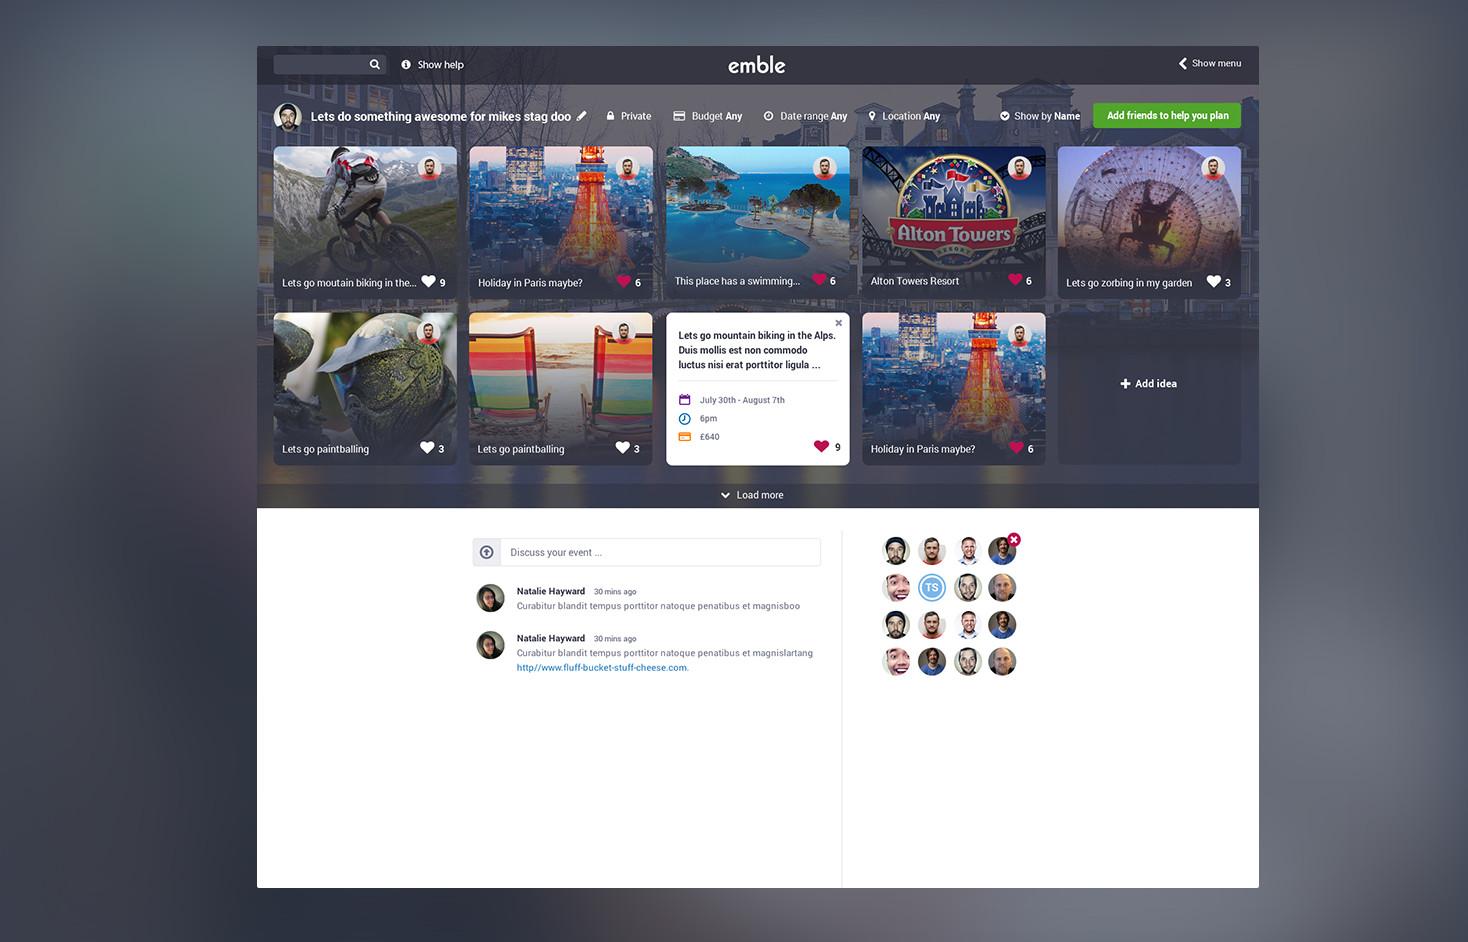 Emble-App-Slider-Image-Plan-Event-Page-Simple-Refined-Design